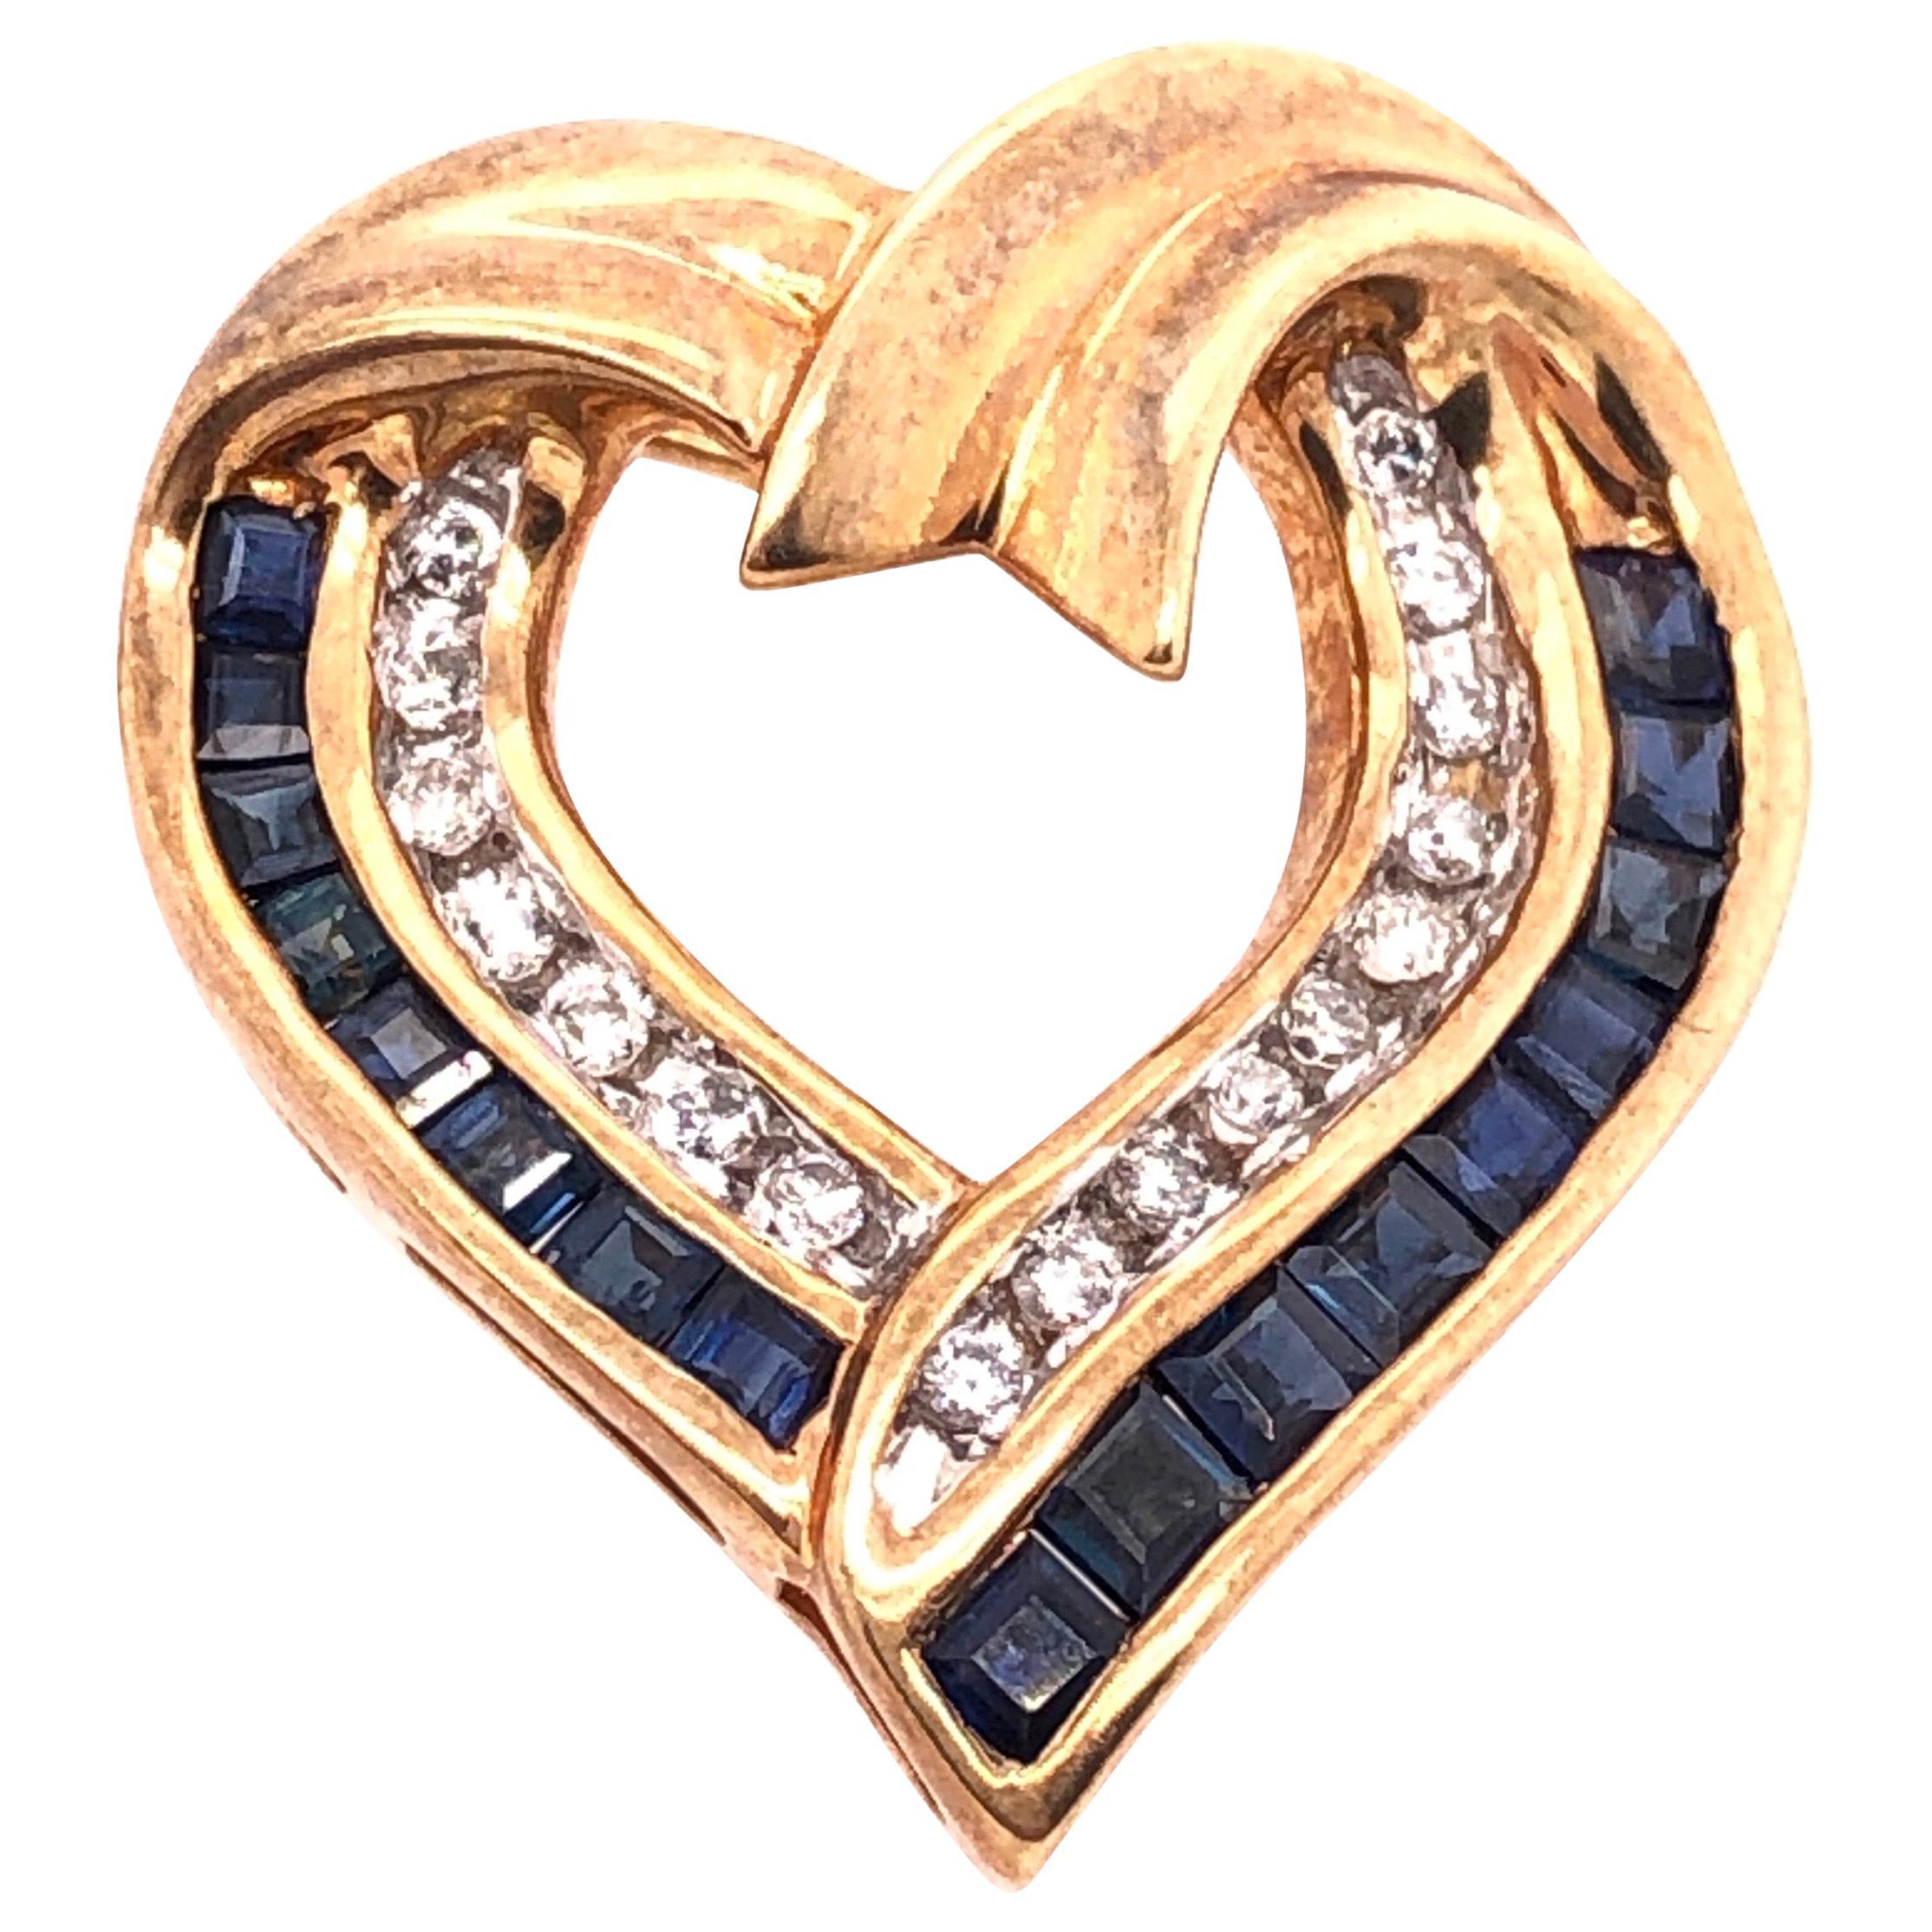 10 Karat Yellow Gold with Sapphire and Diamond Charm / Heart Pendant